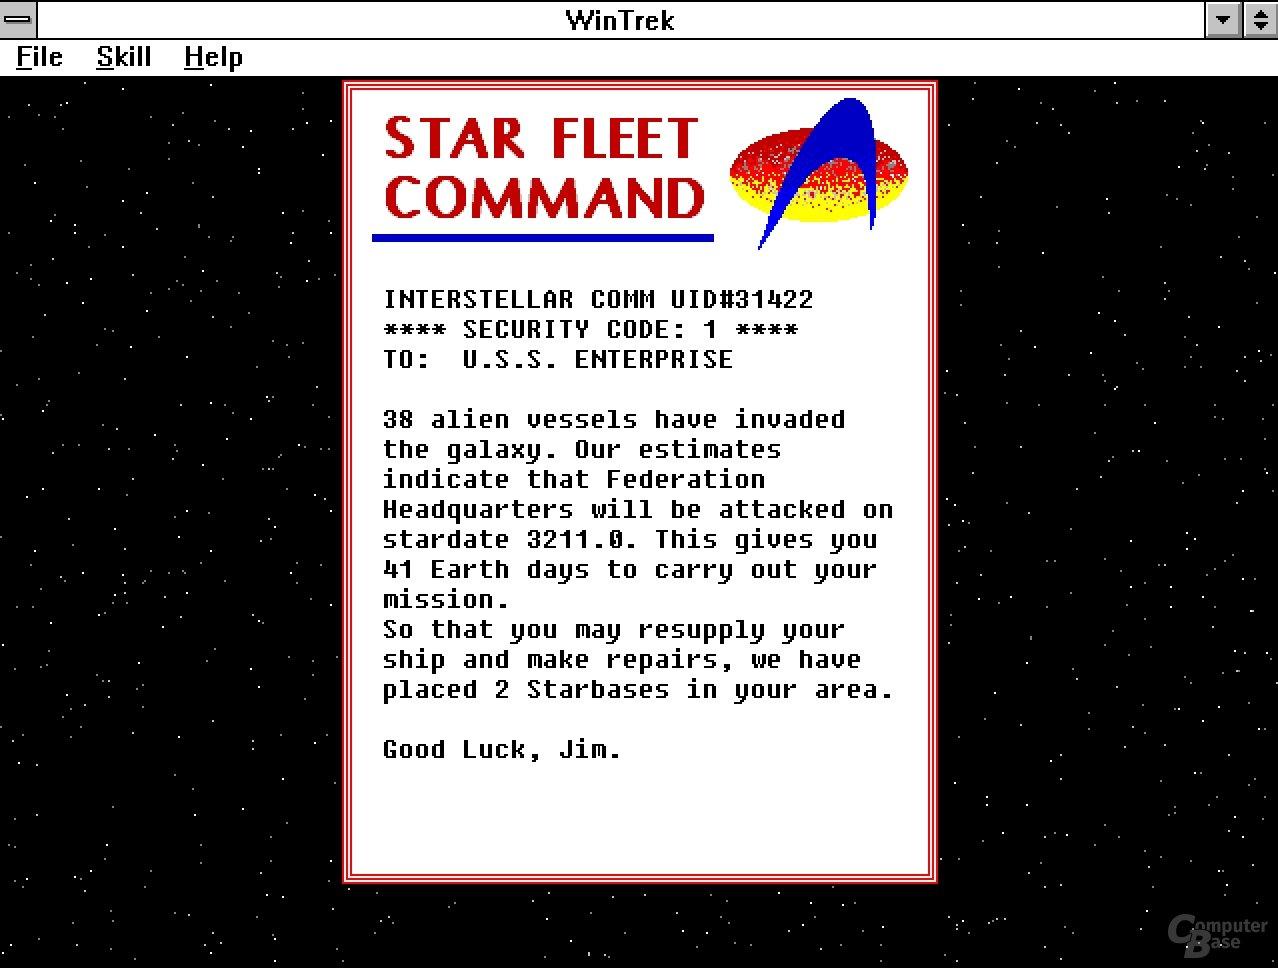 WintrekJ bringt Star Trek auf Windows 3.1